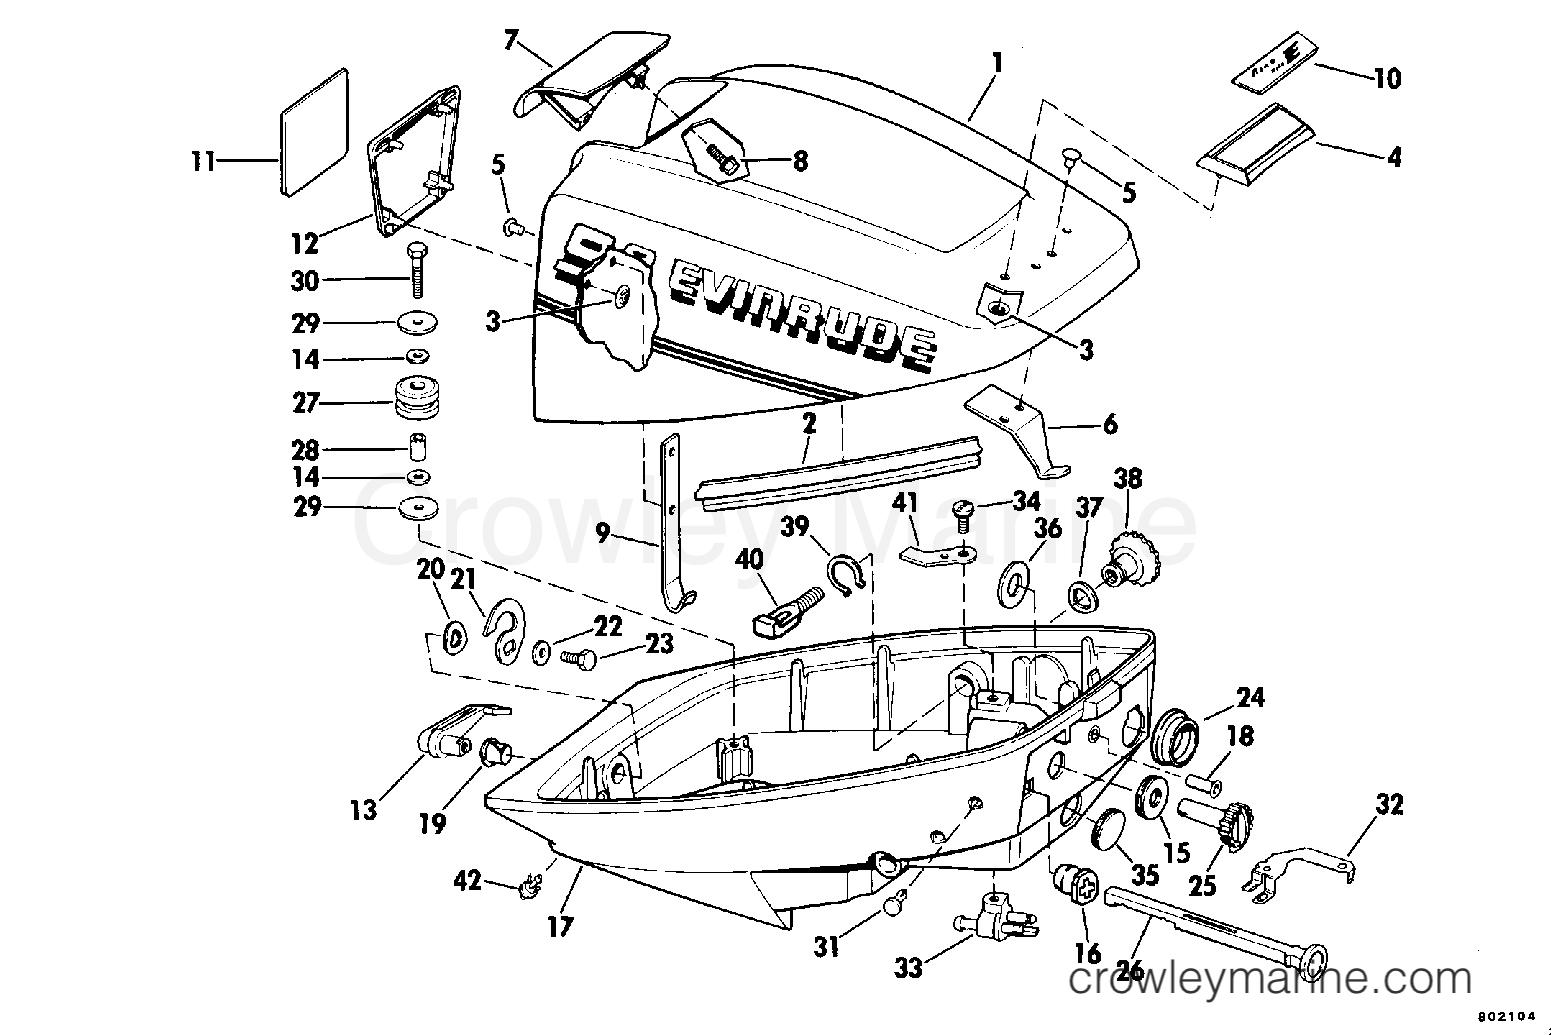 Motor Cover